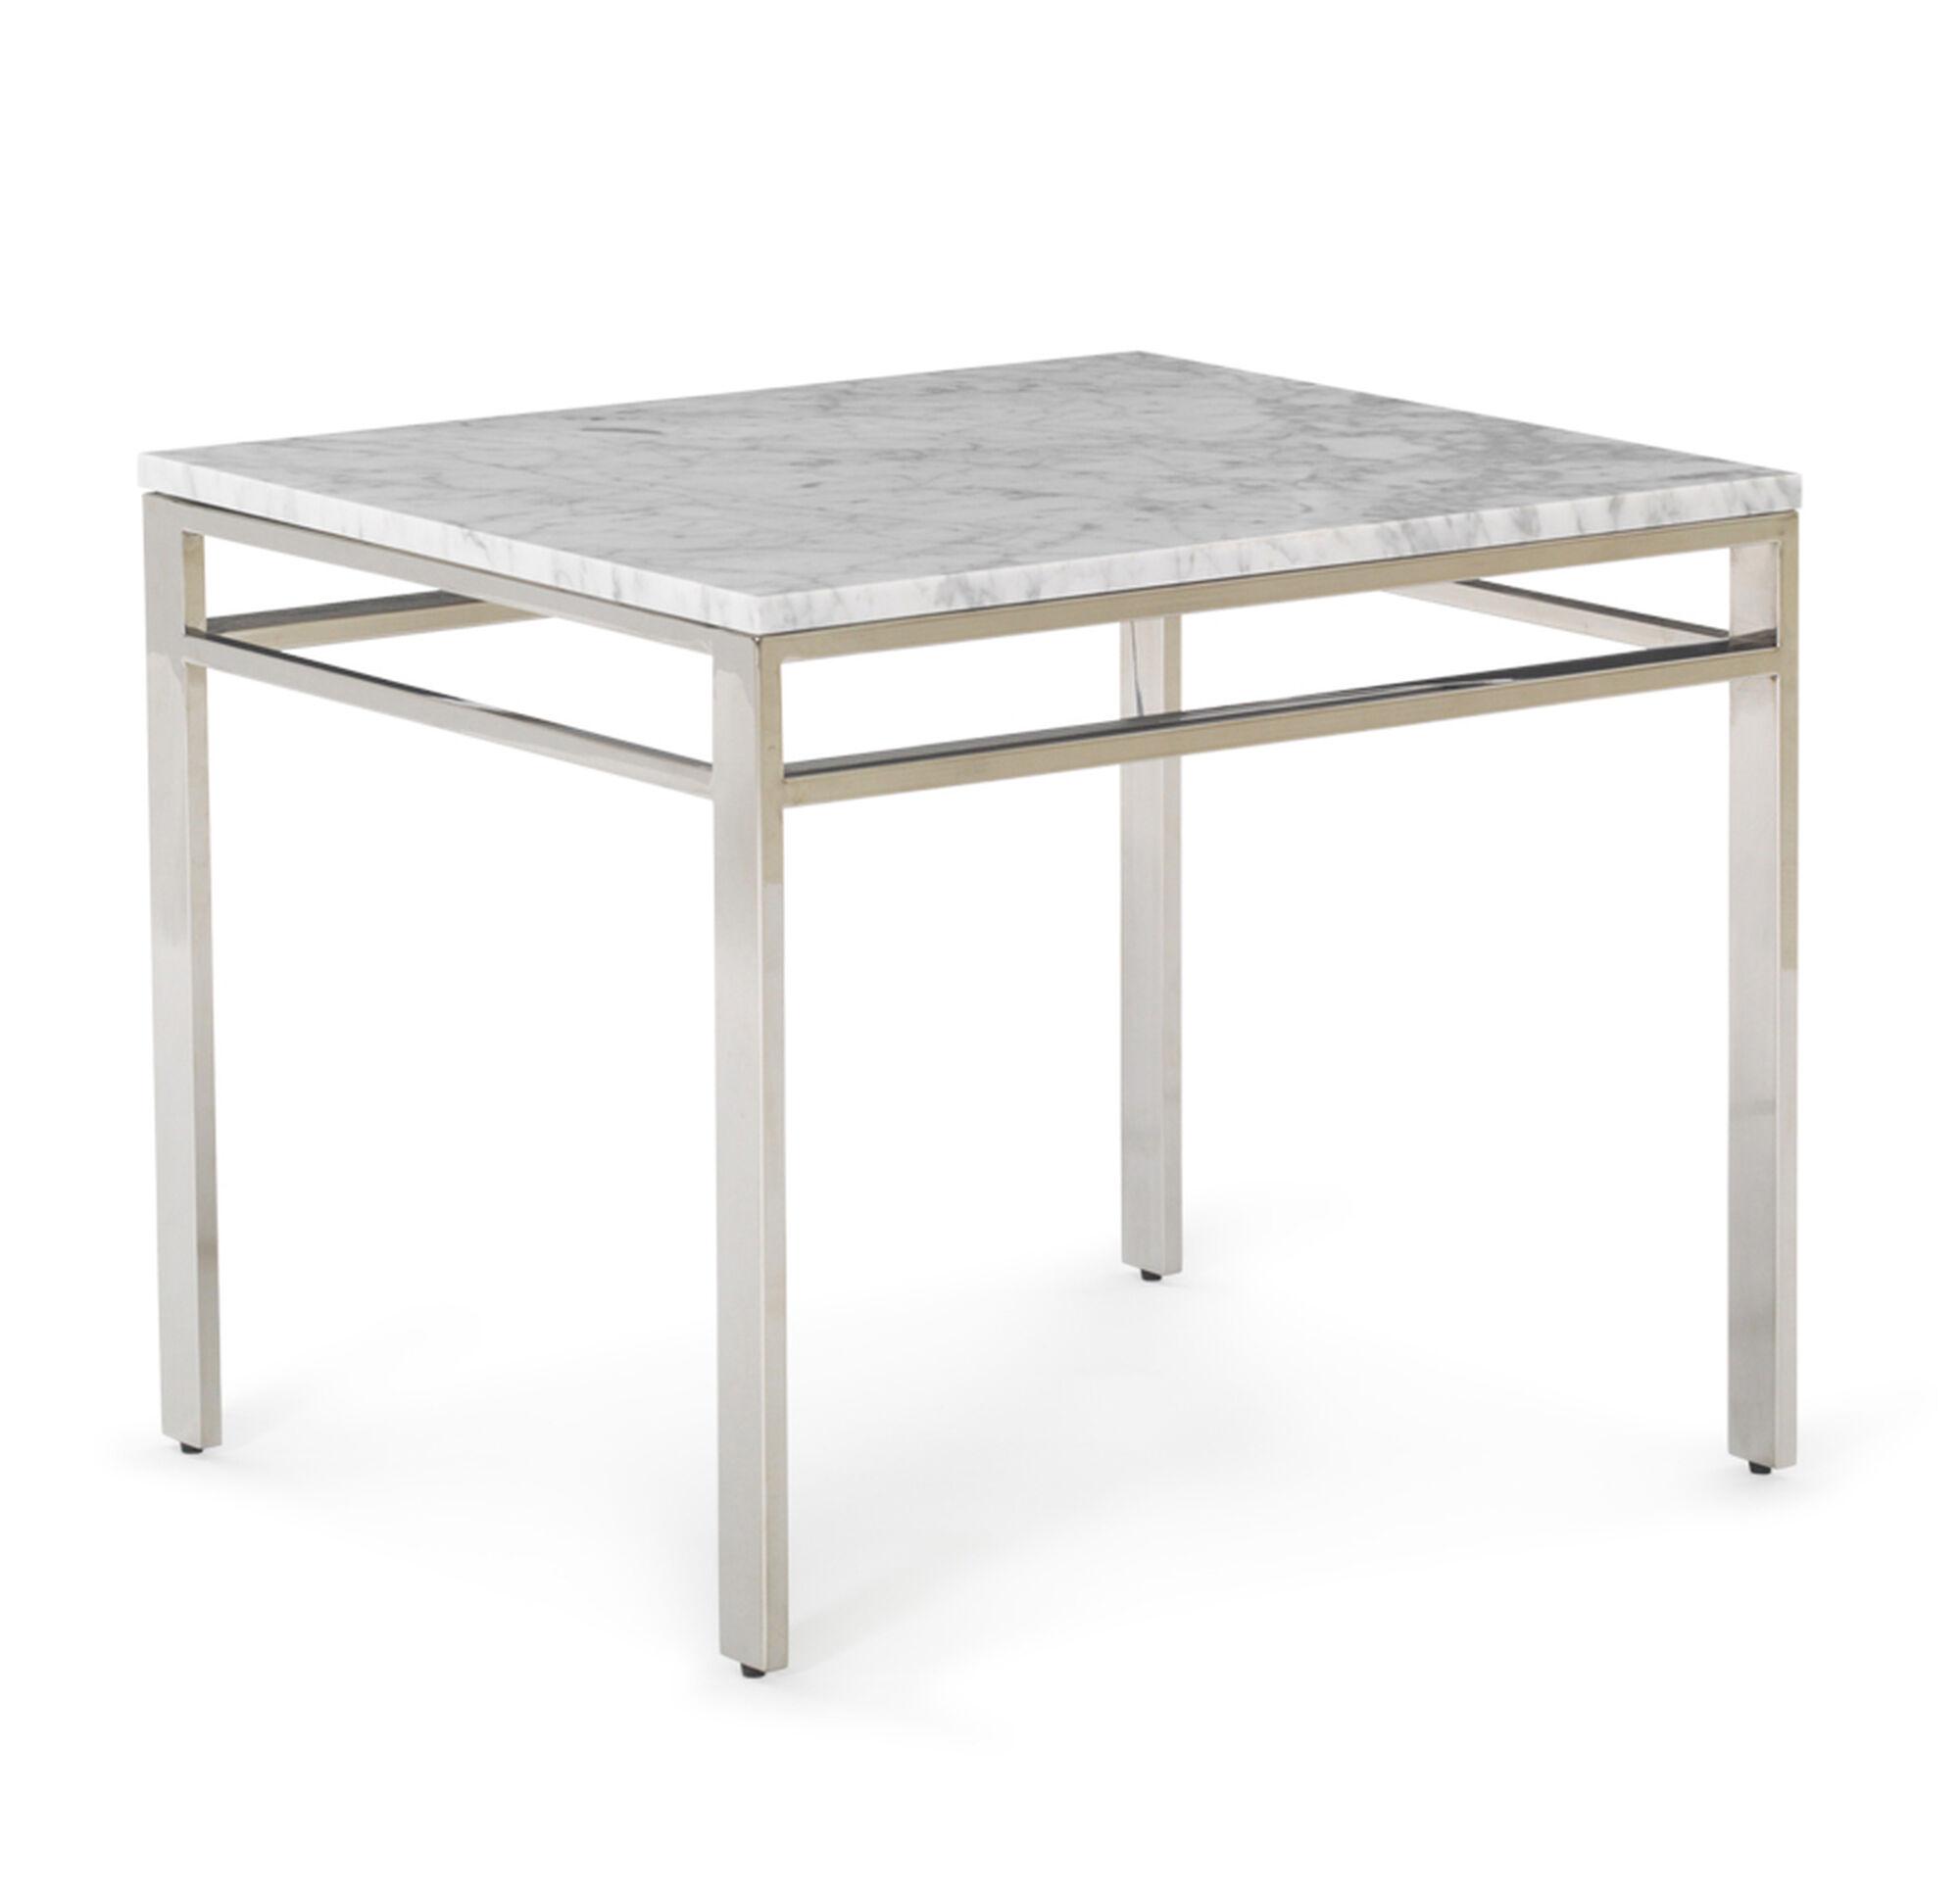 YORK SIDE TABLE